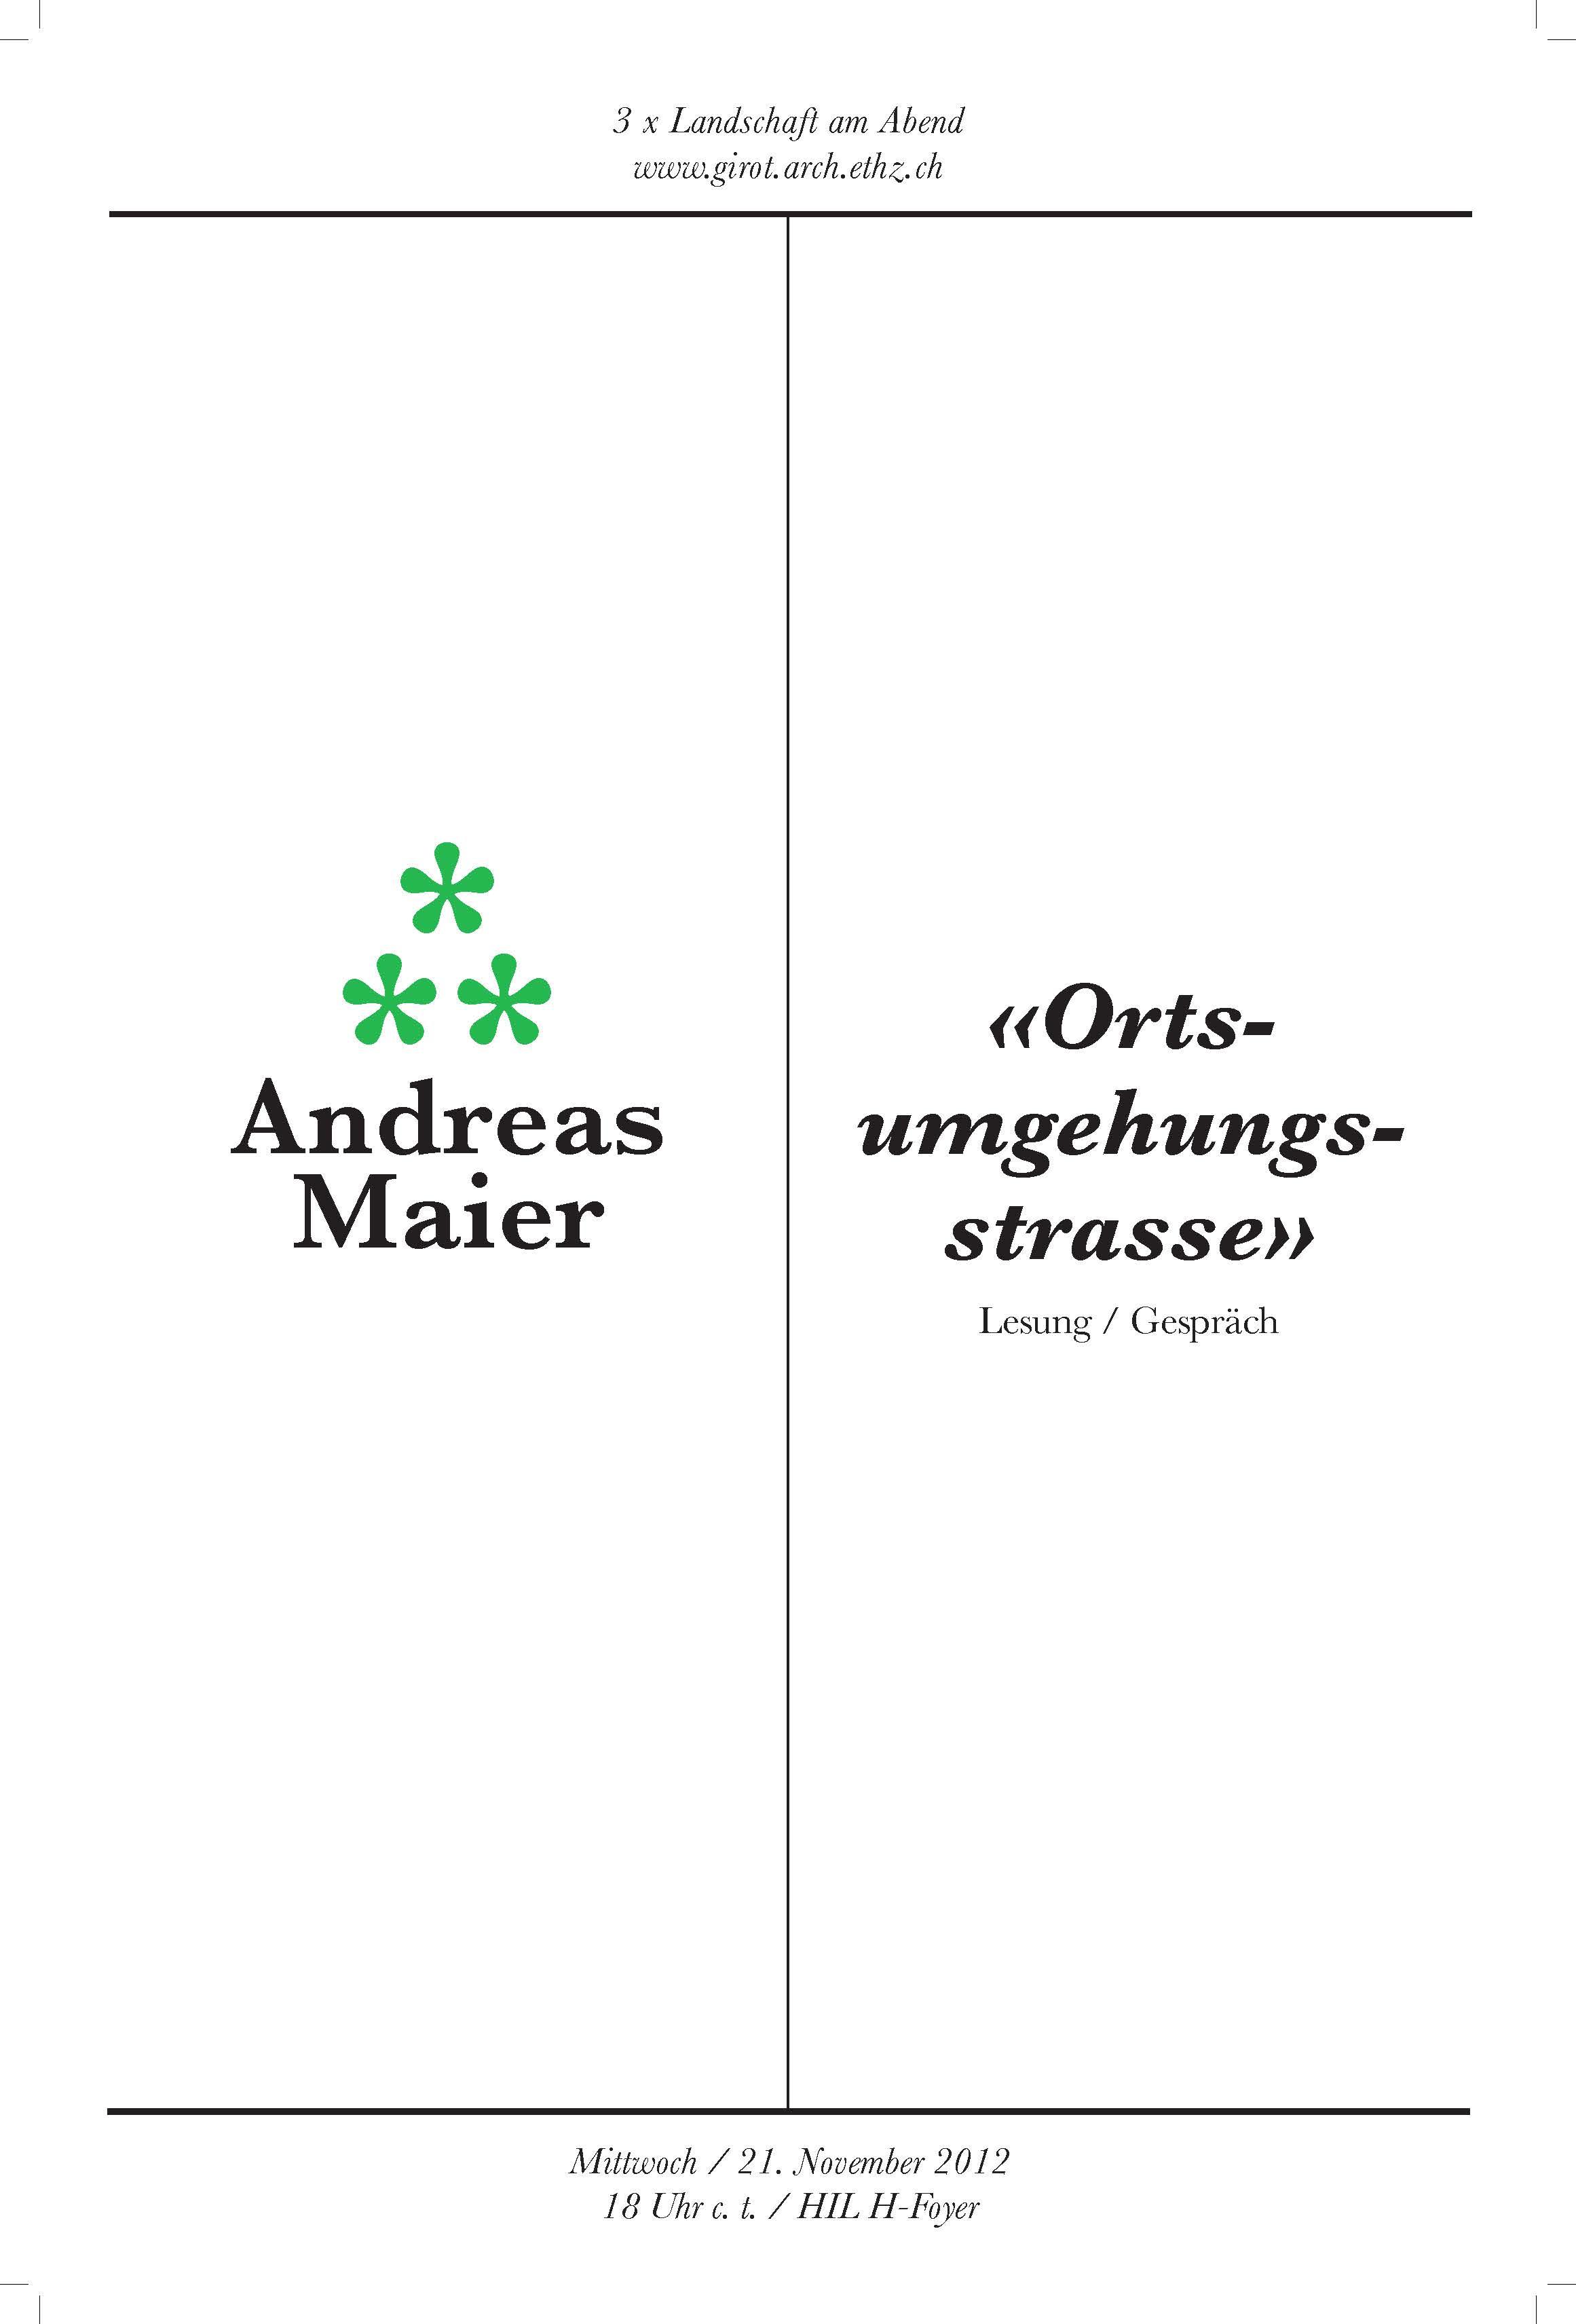 Evening Talks on Landscape: Andreas Maier - Ortsumgehungsstrasse